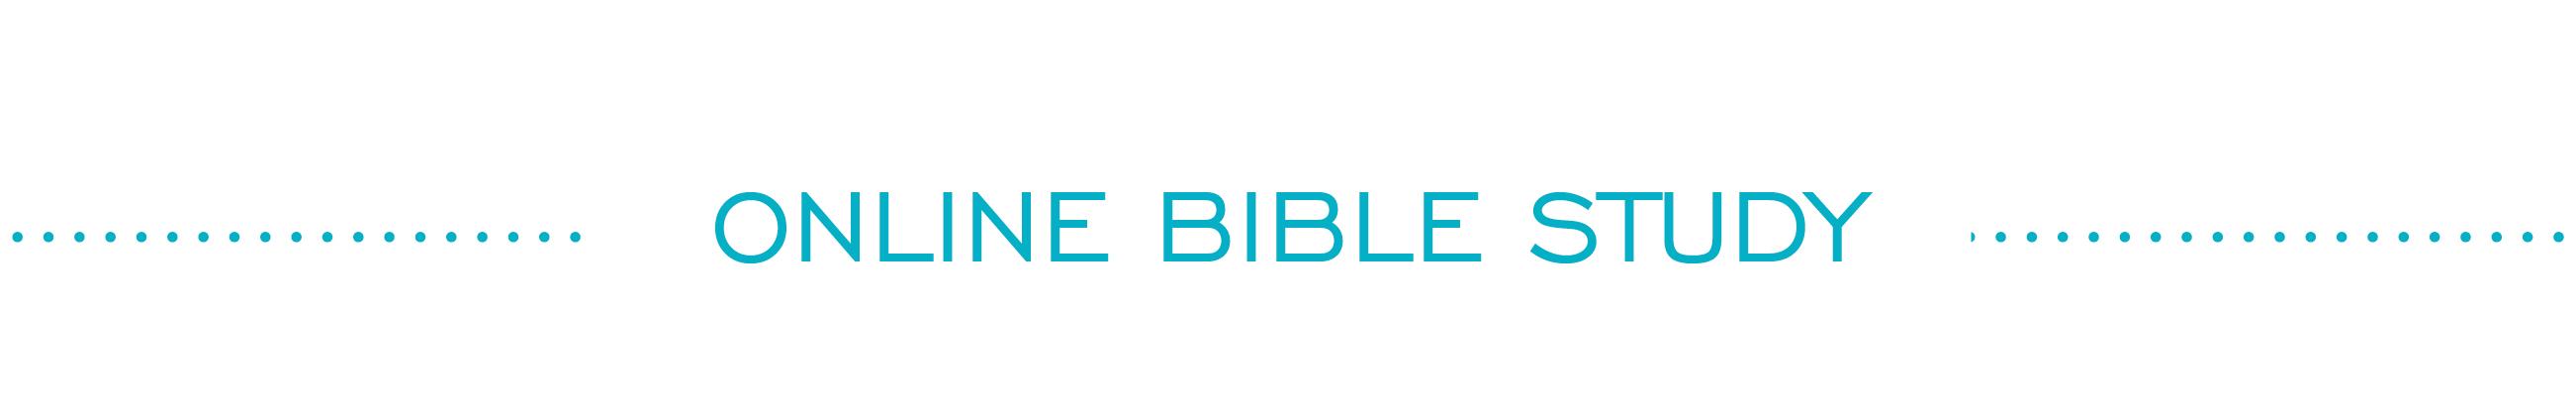 online bible study header image